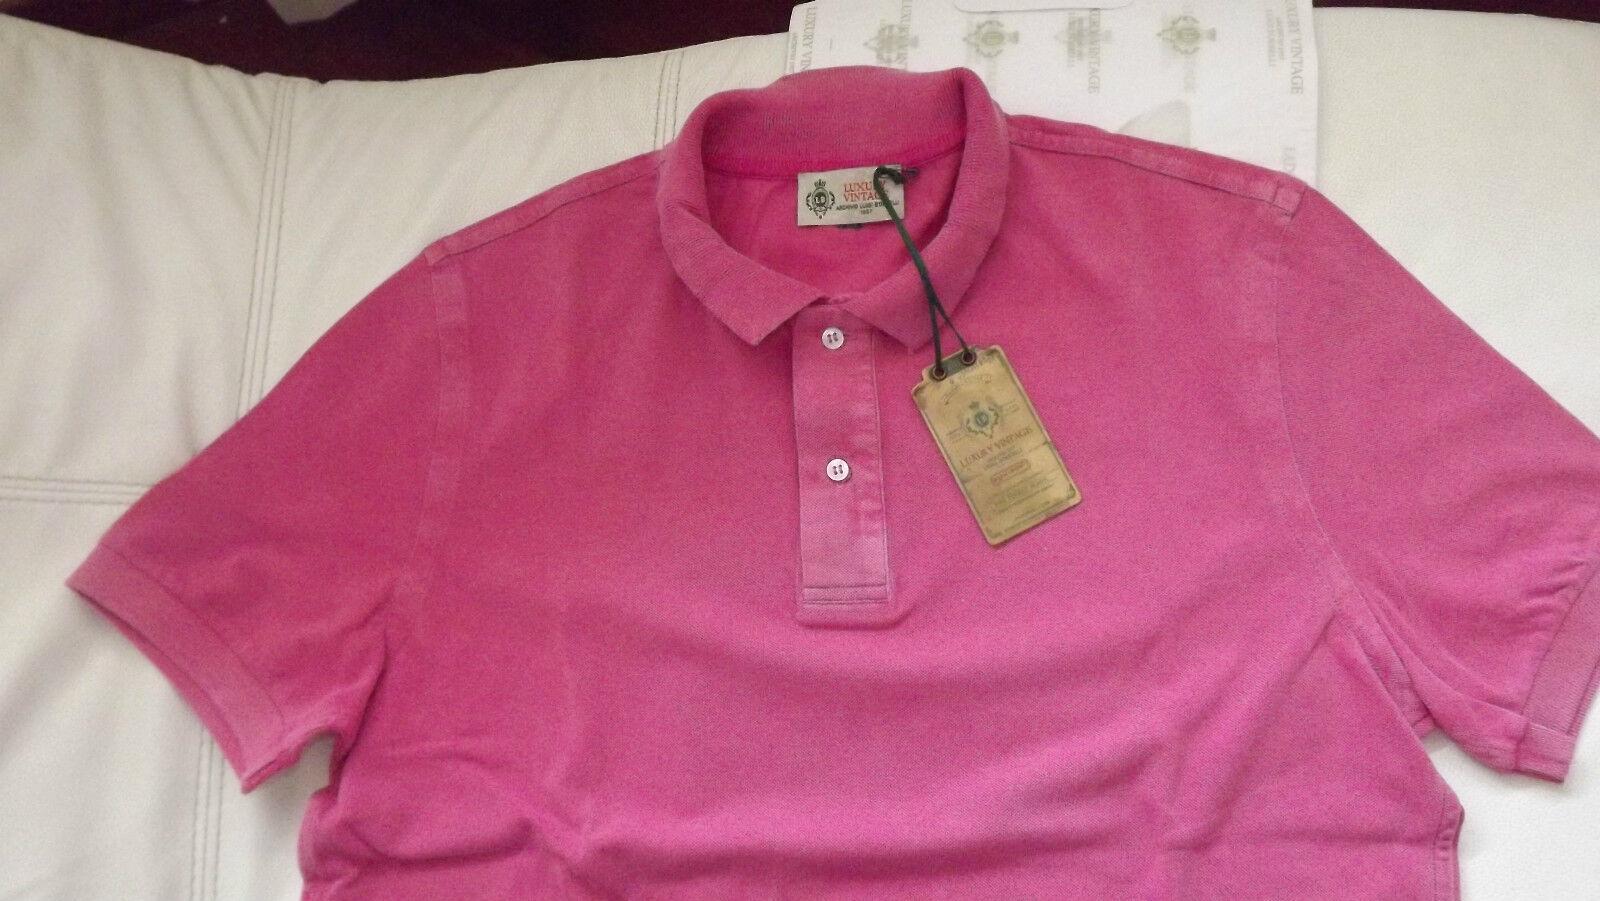 Borrelli NAPOLI REAL CASA Polo Shirt Cotton Honeycomb Größes 50 210,00 caertell logo.